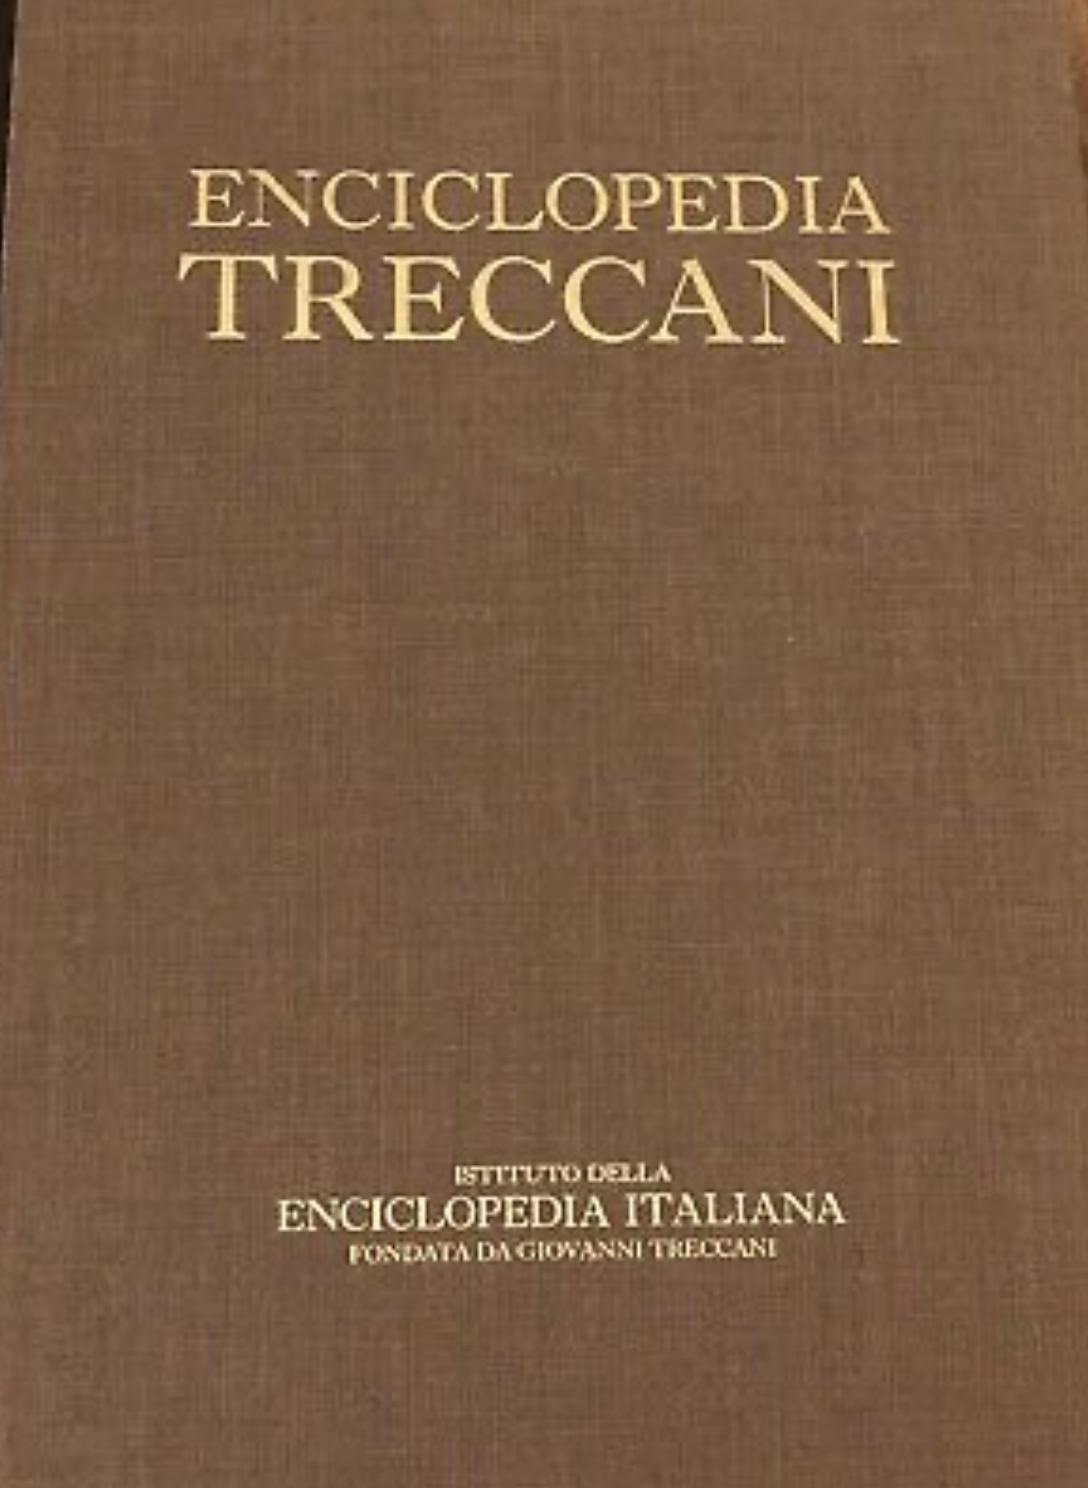 Enciclopedia Italiana Treccani